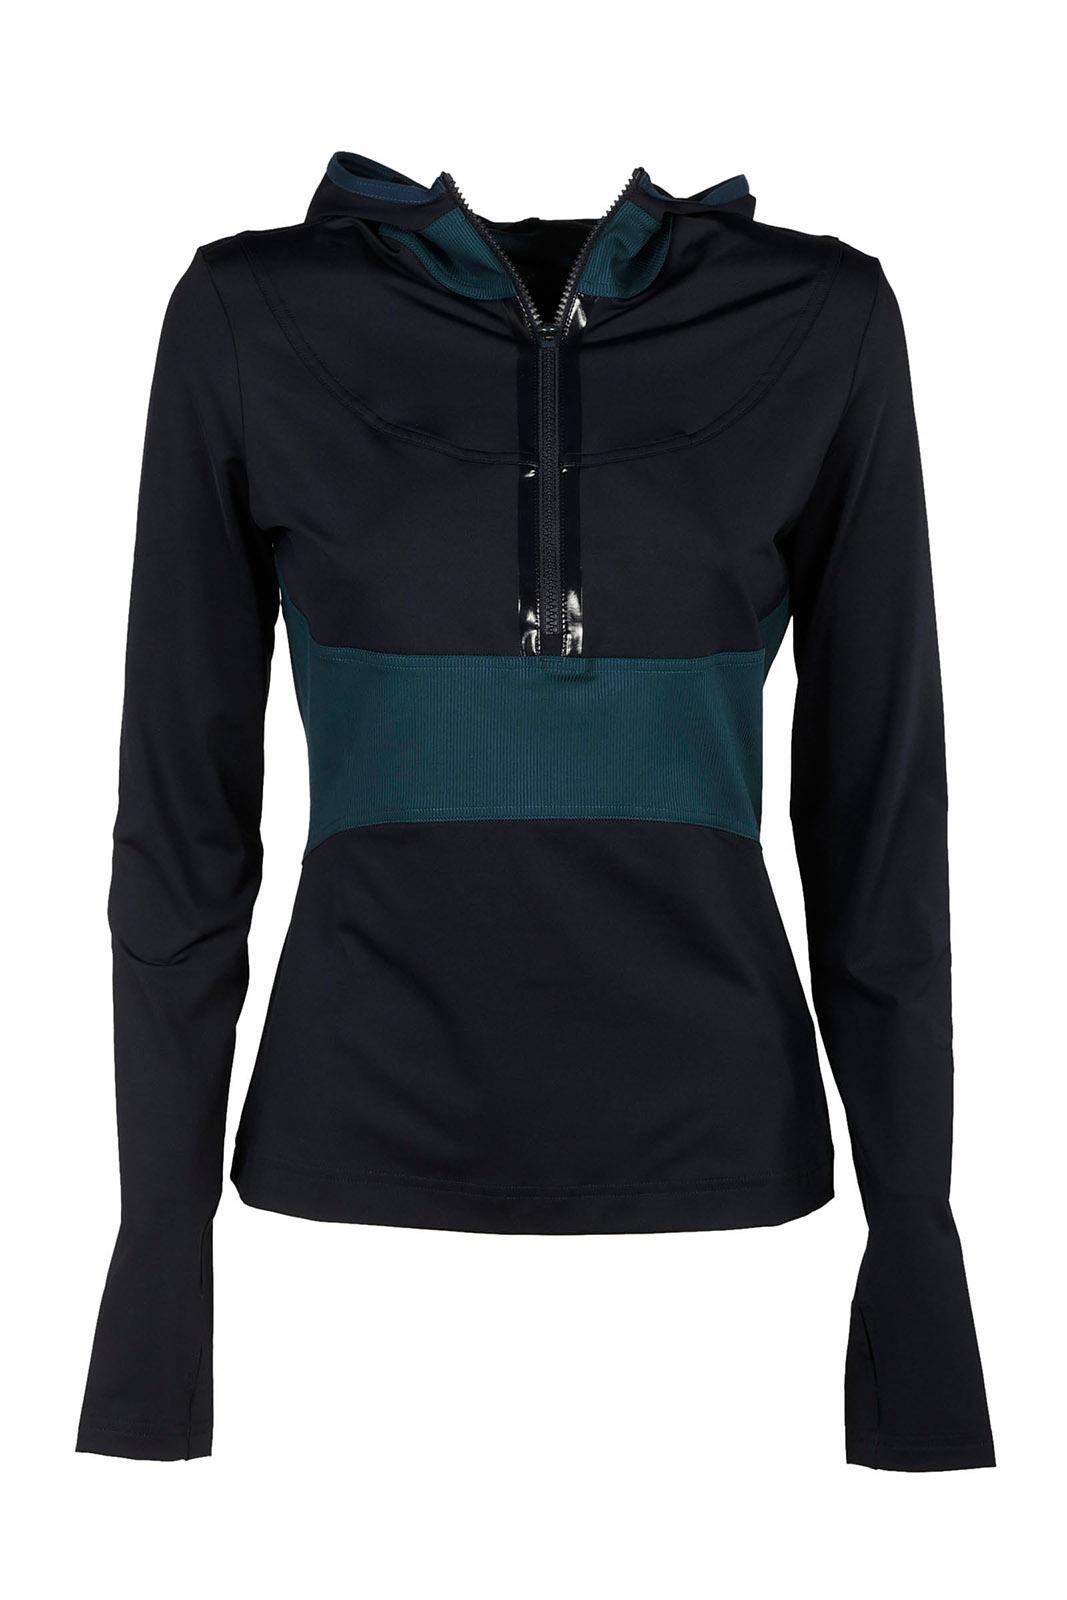 huge selection of authentic quality coupon code Damen Sweatshirt Kapuzen Kapuzensweatshirt Pulli in Blue